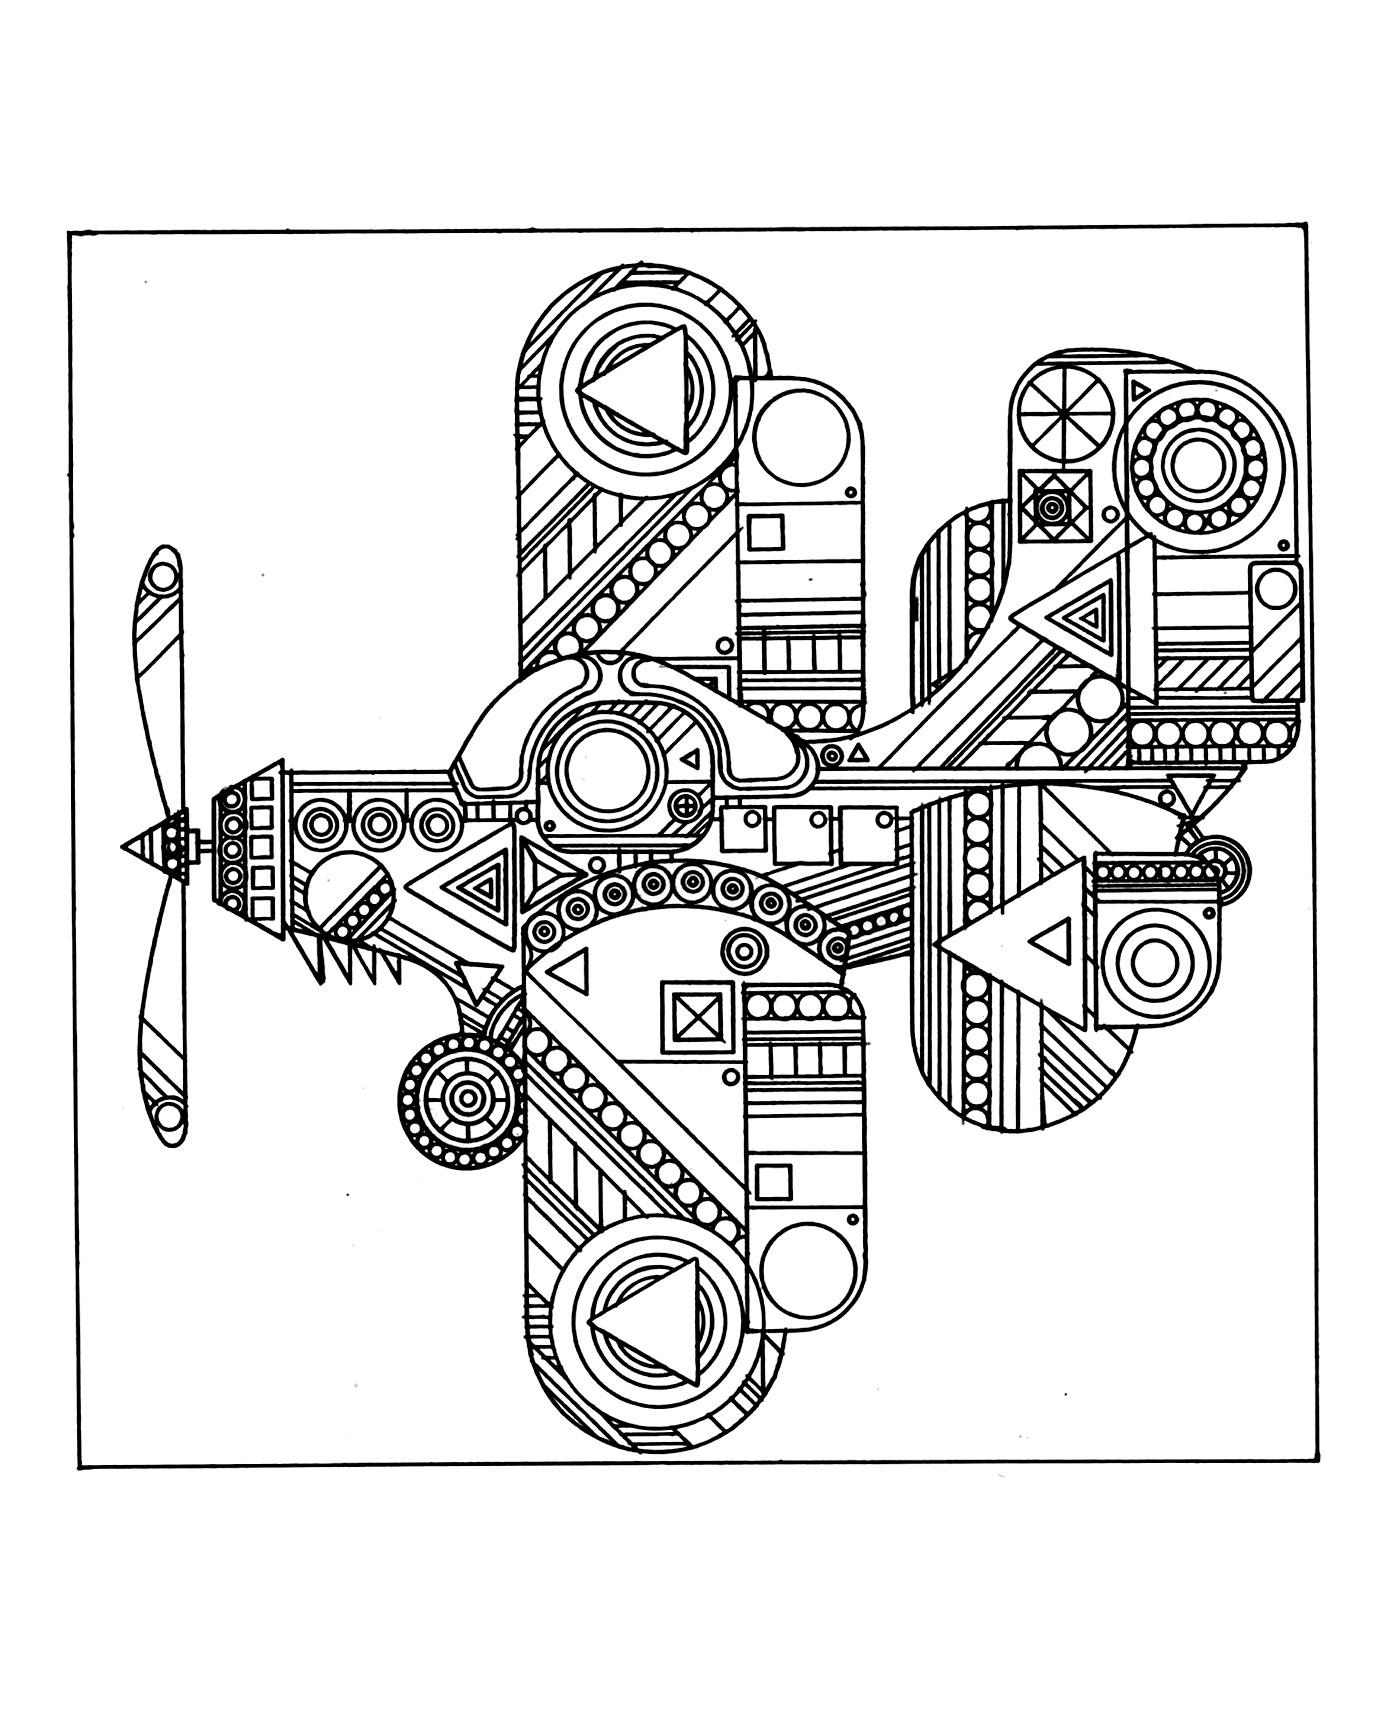 Plane zen - Image with : Plane